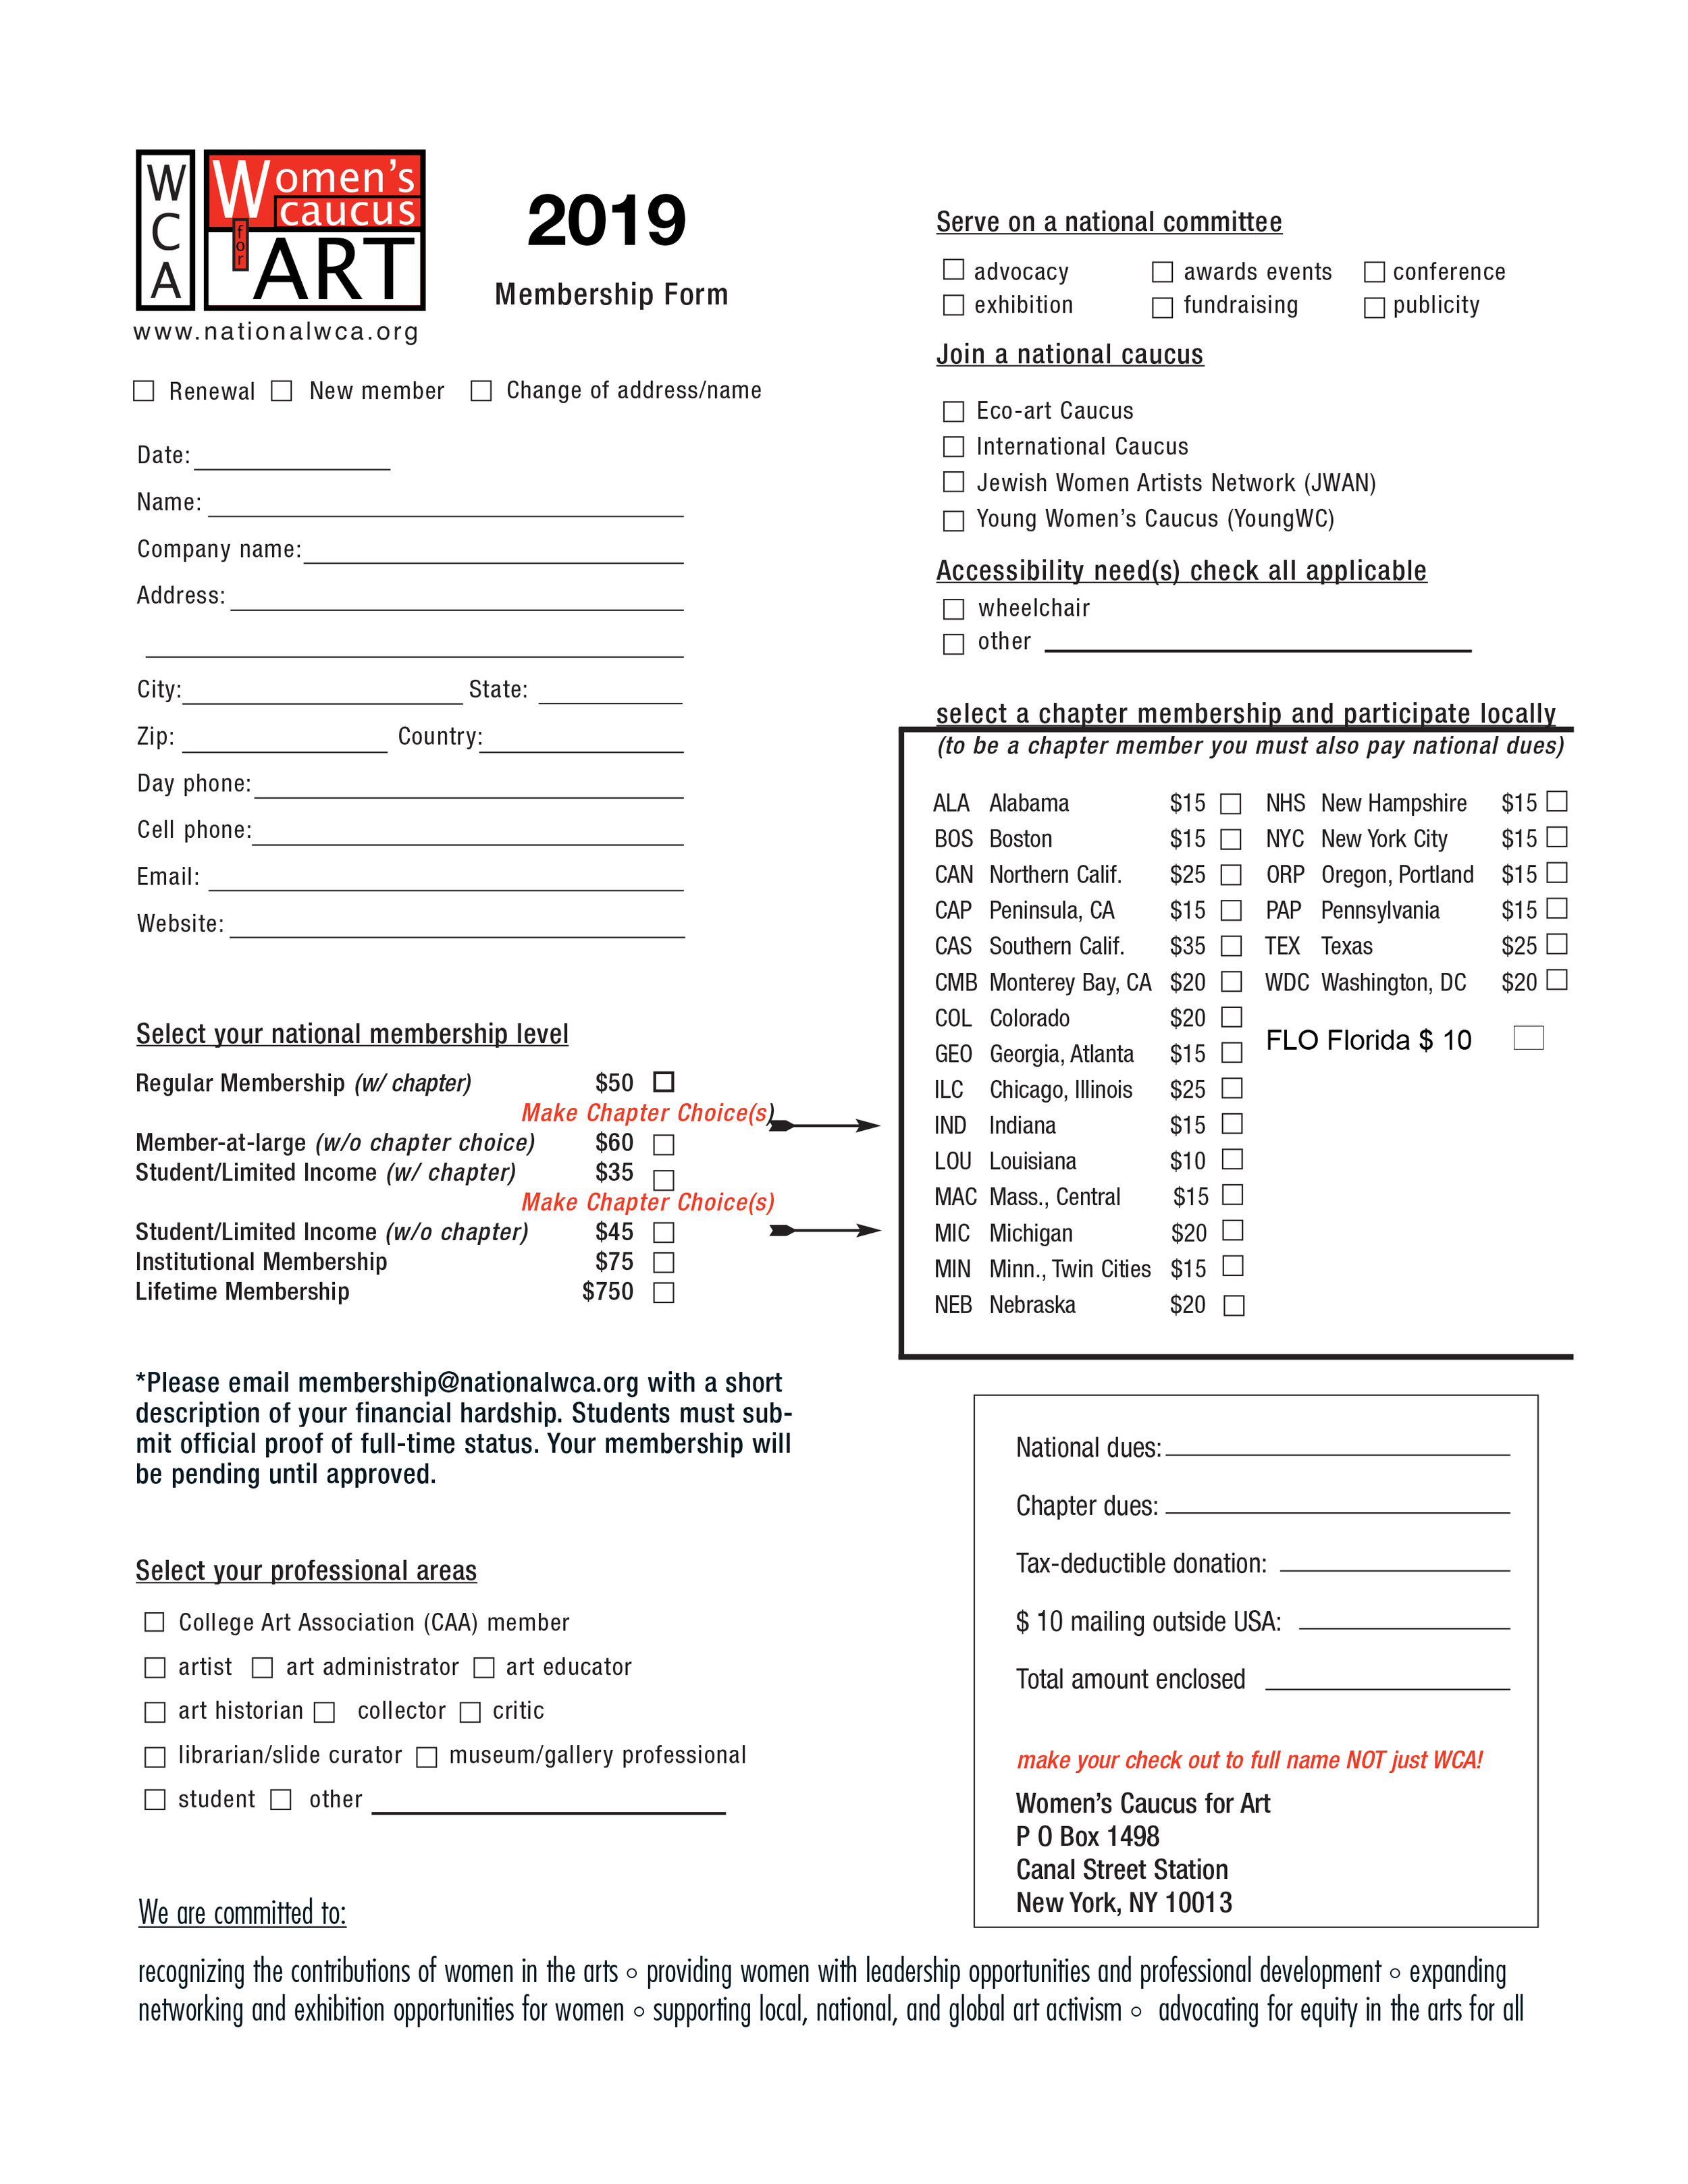 2019-application-form.jpg